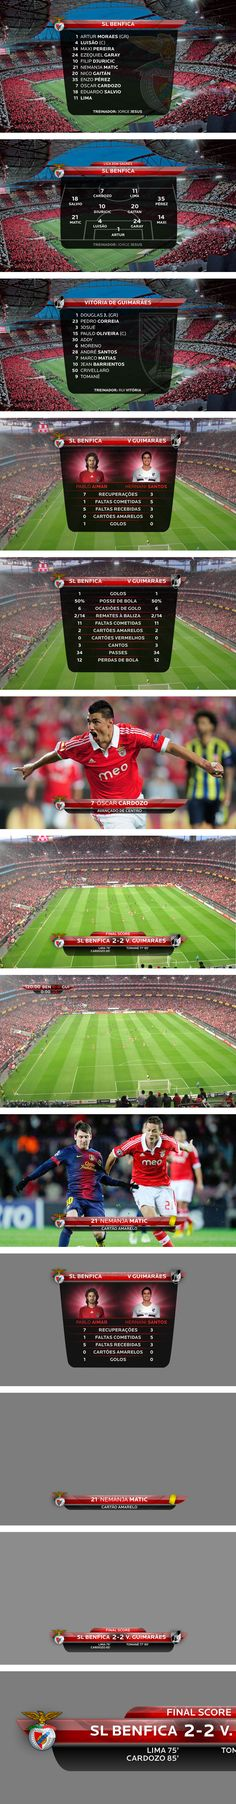 Benfica TV - On-air design - Paulo Garcia